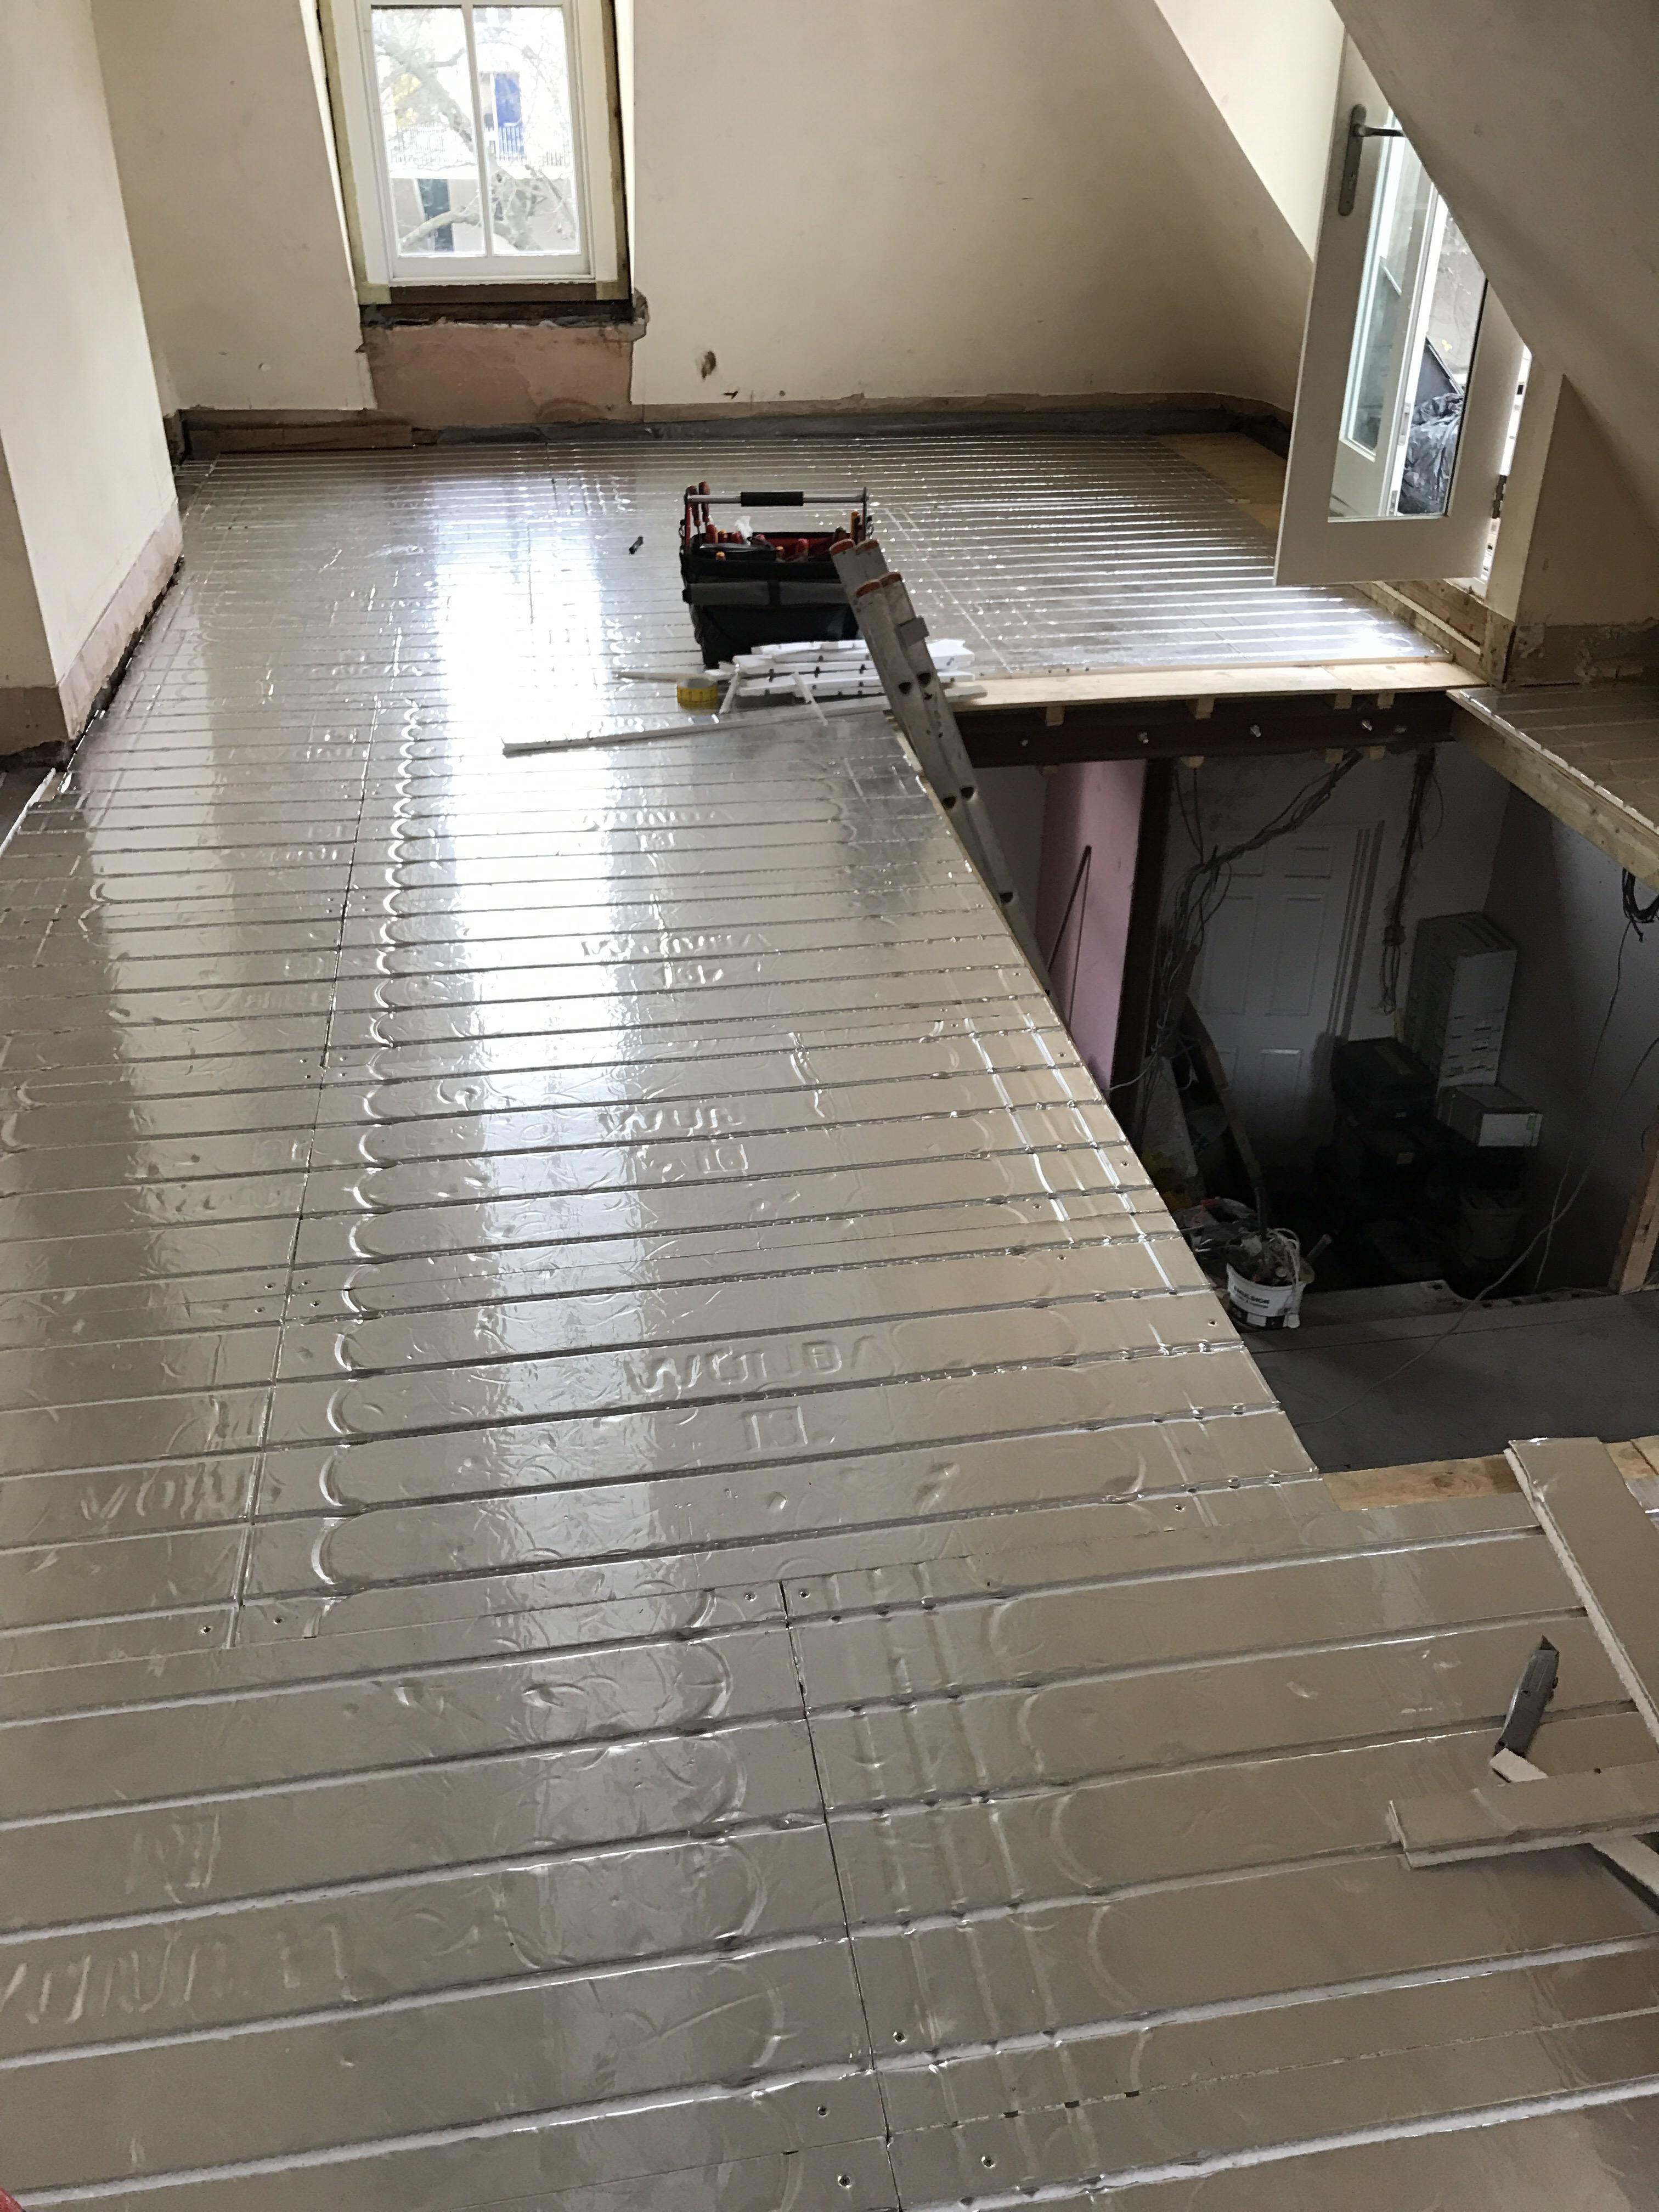 Vunda underfloor heating panels